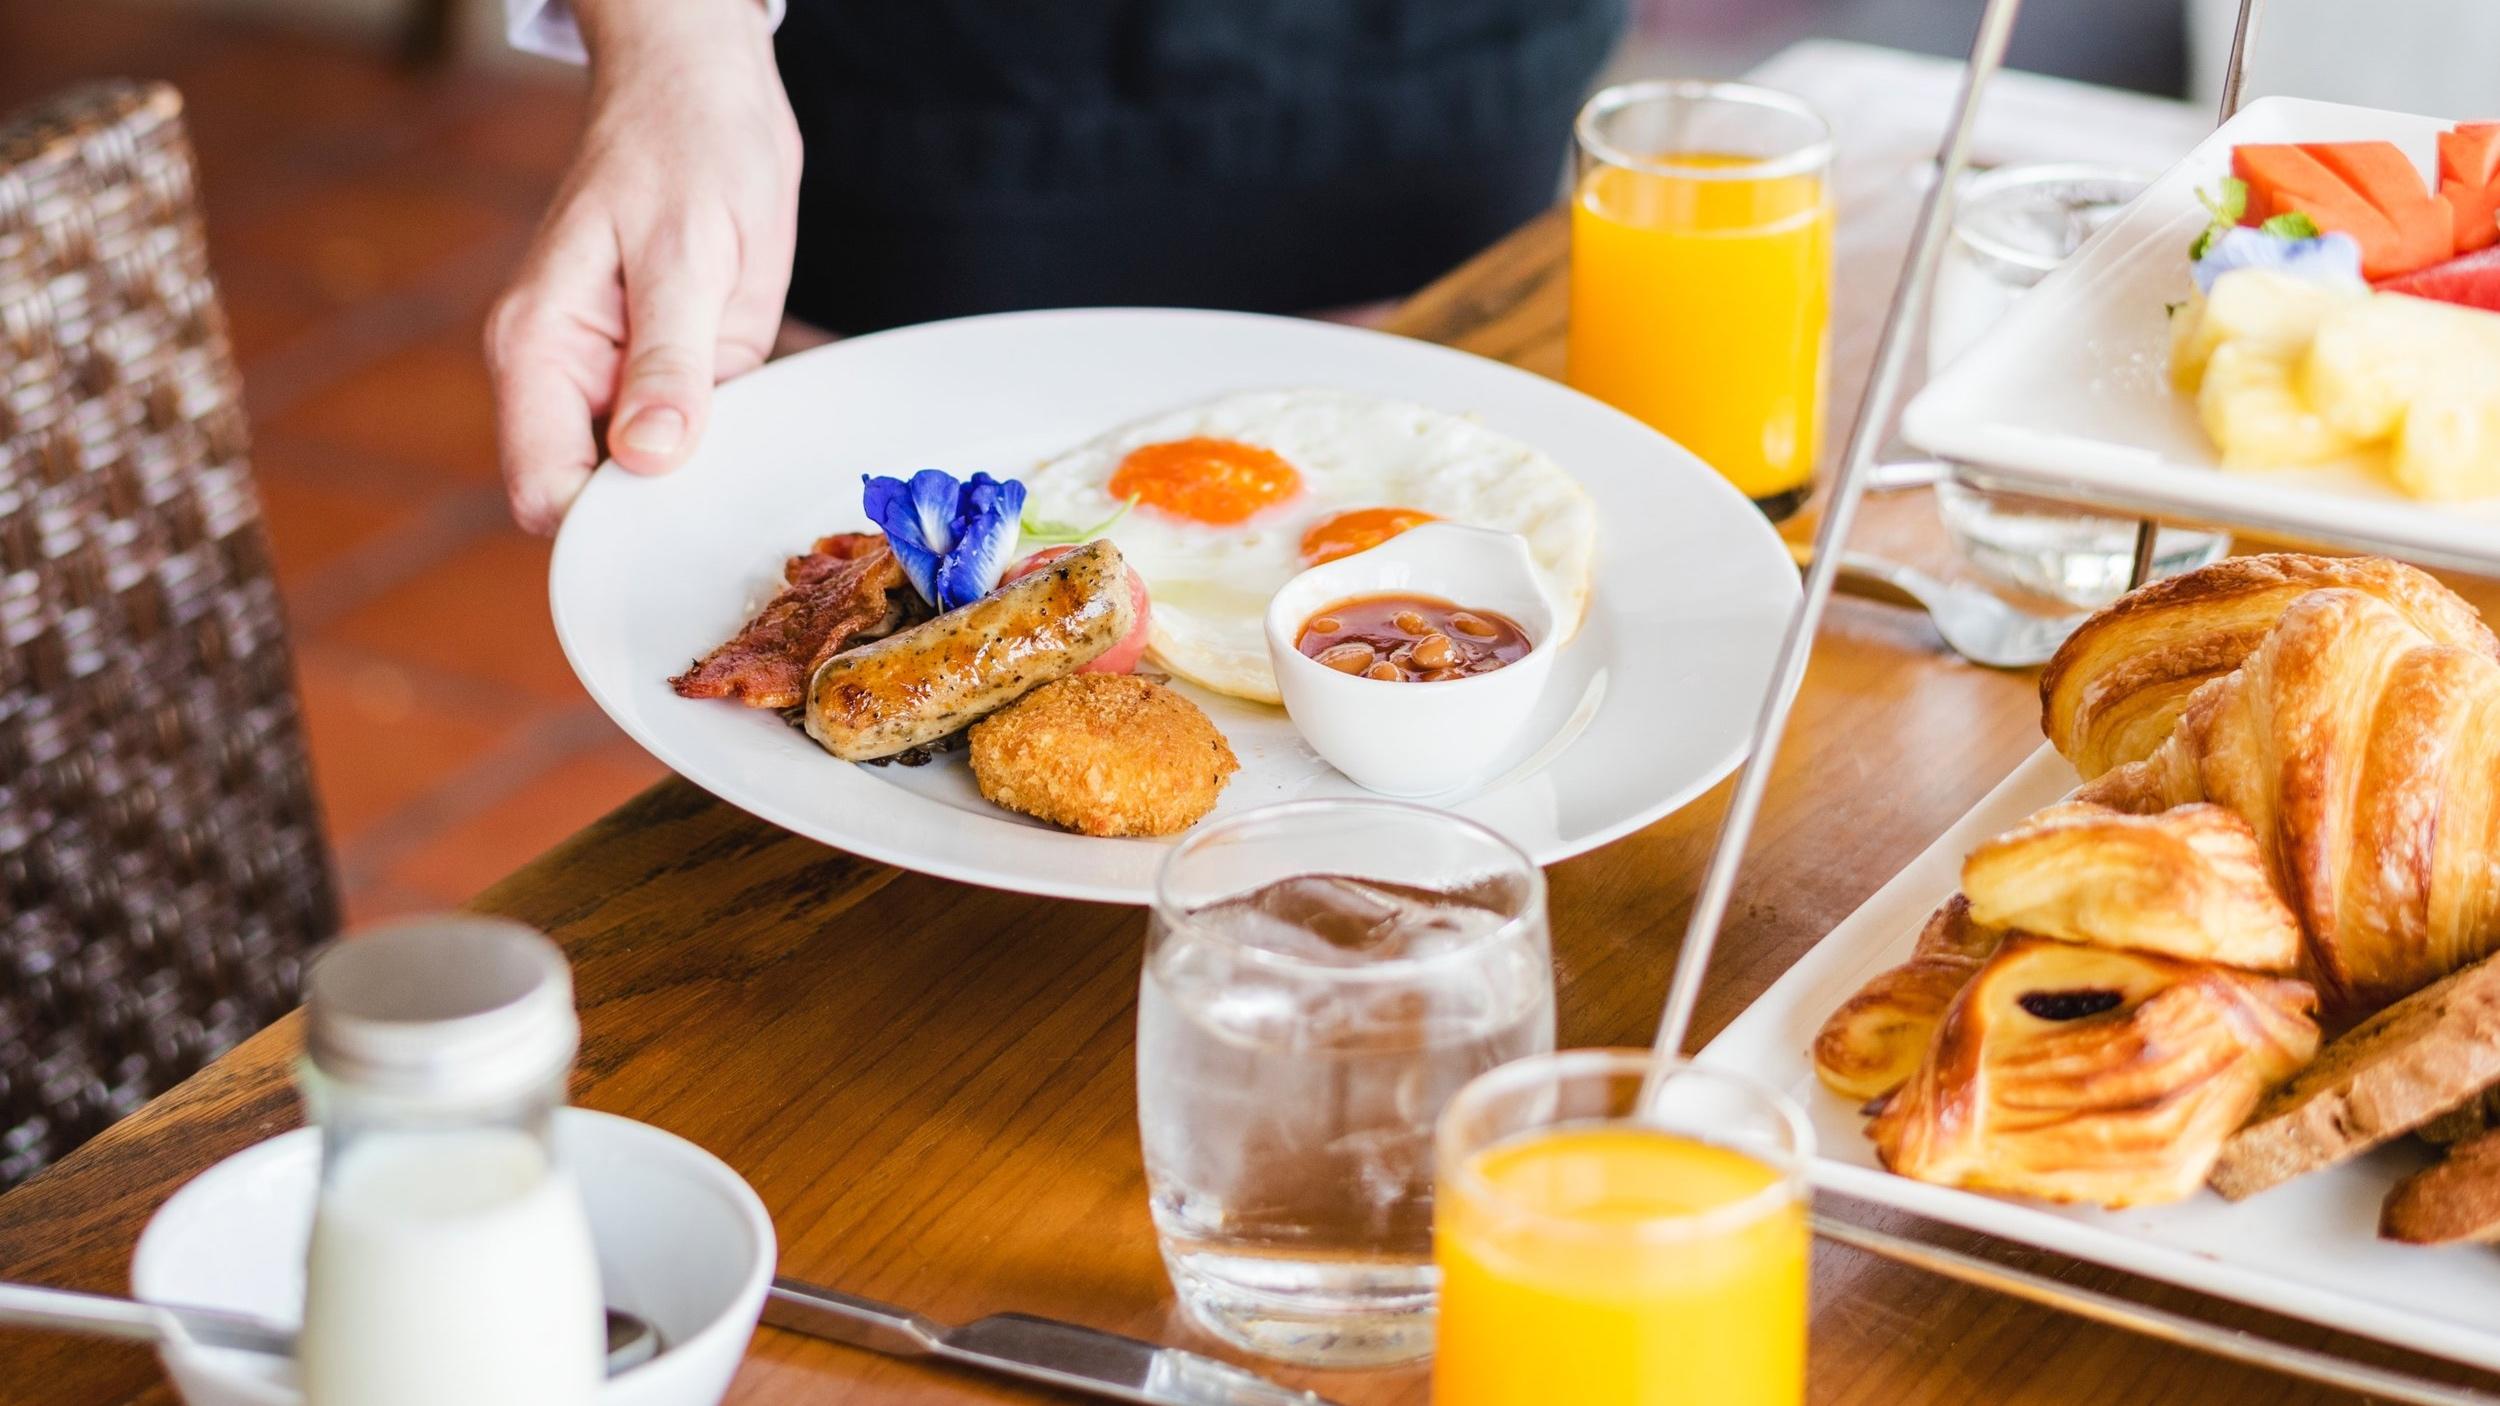 beverage-breakfast-brunch-1385748.jpg